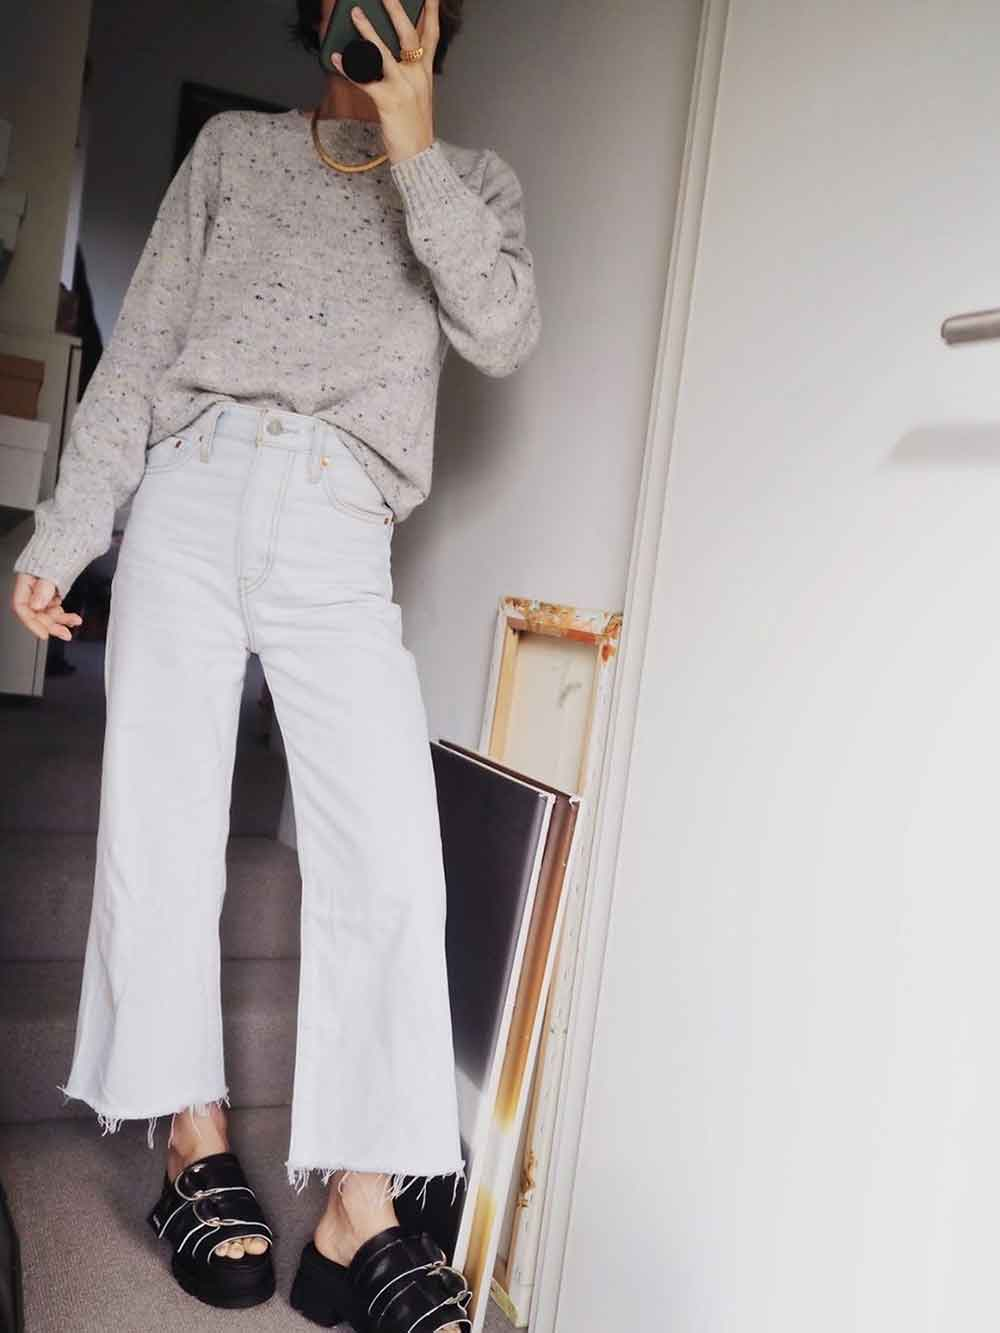 Stylonylon Spring Knitwear Grey Jumper and white jeans